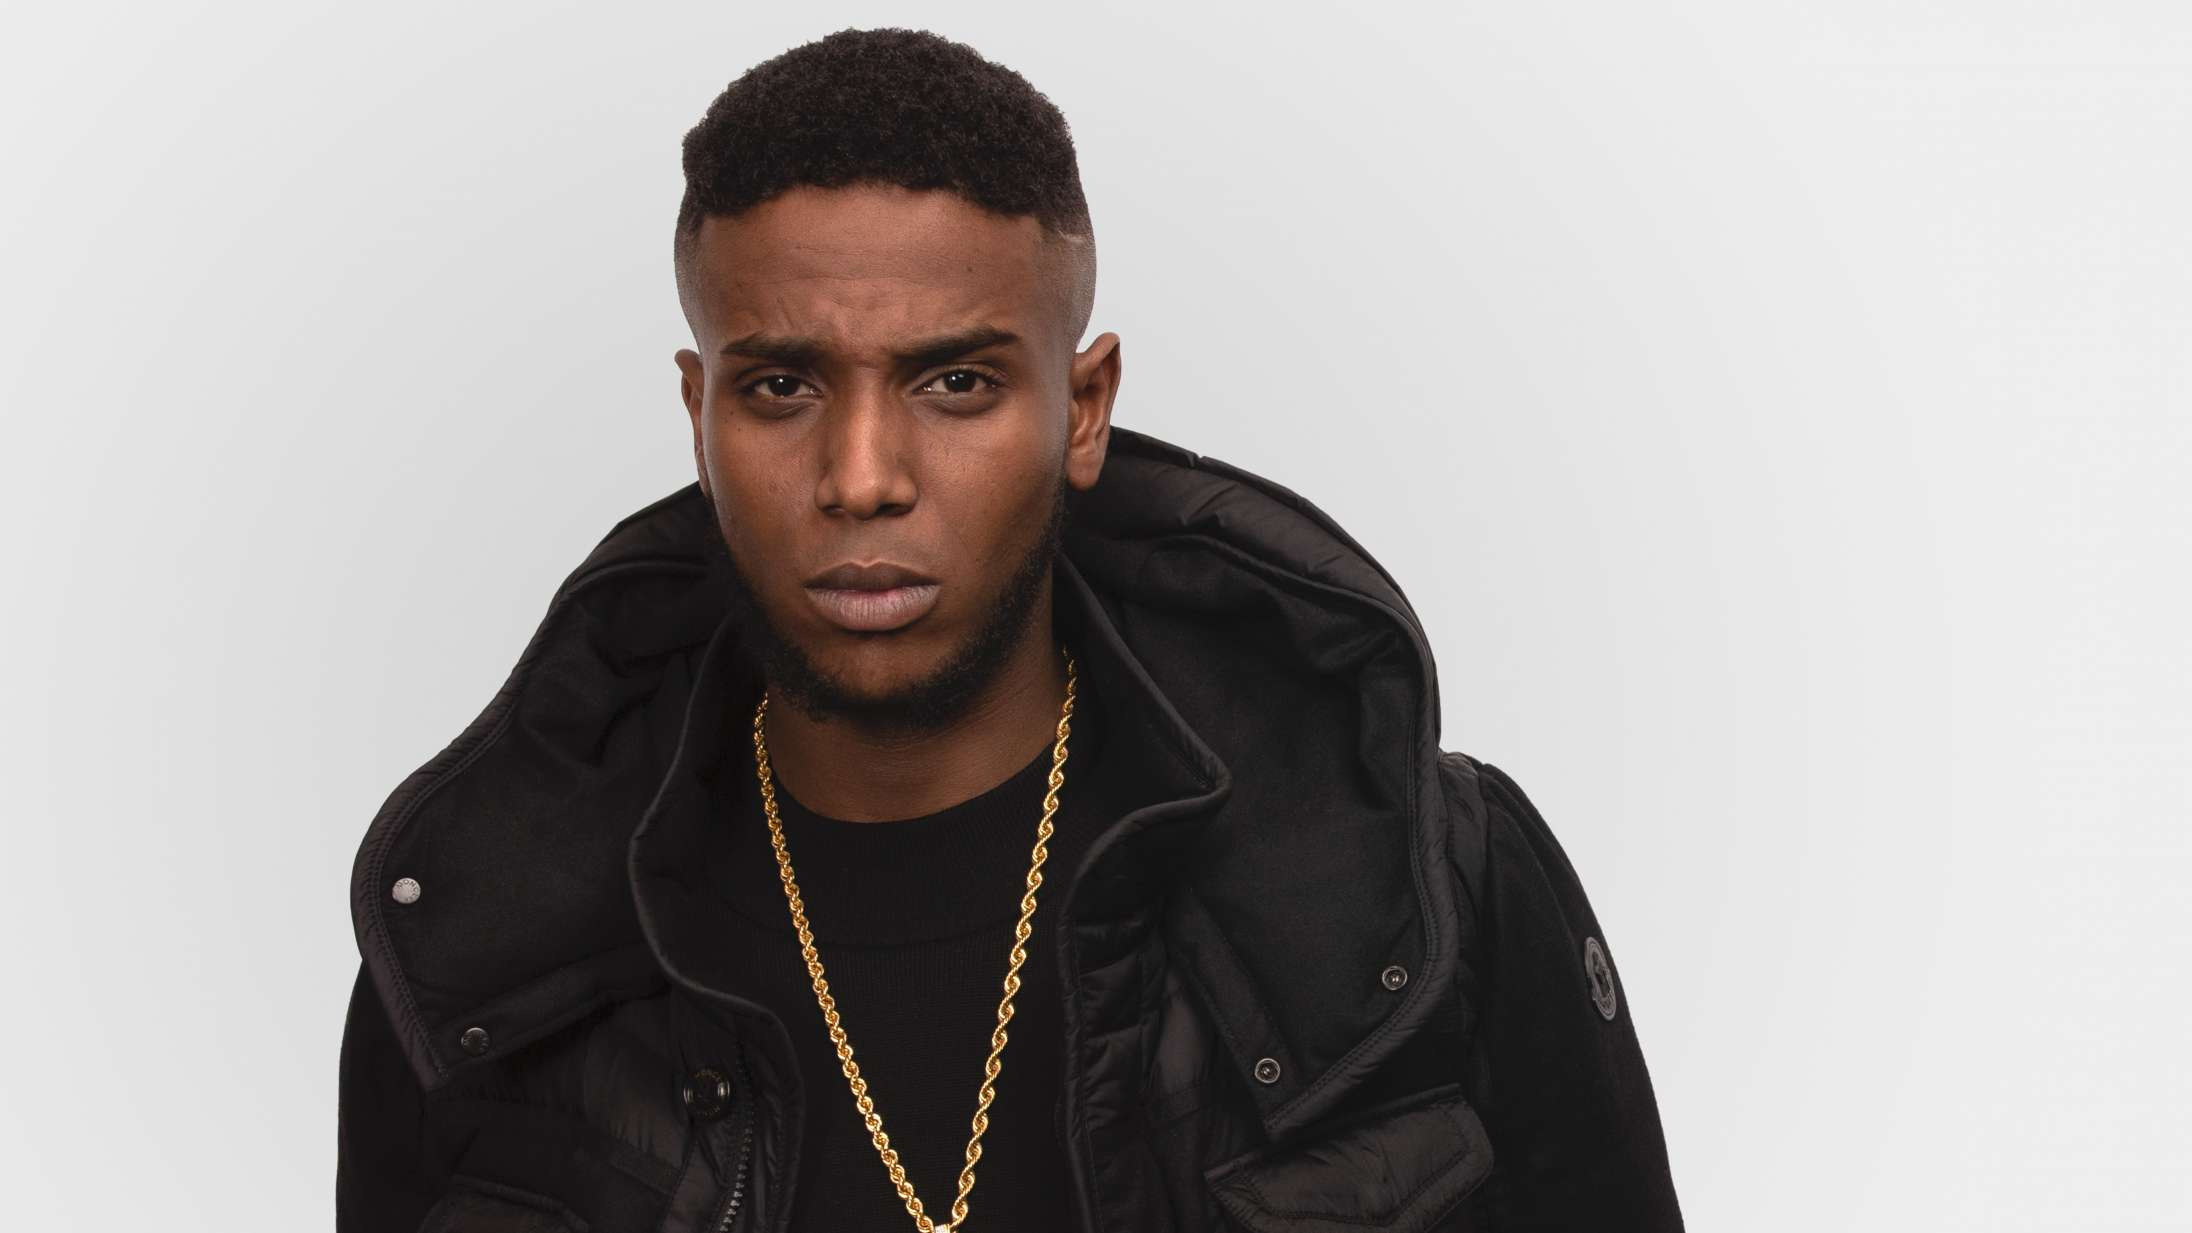 Jamaikas nye single er en øm sang til rapperens ufødte barn